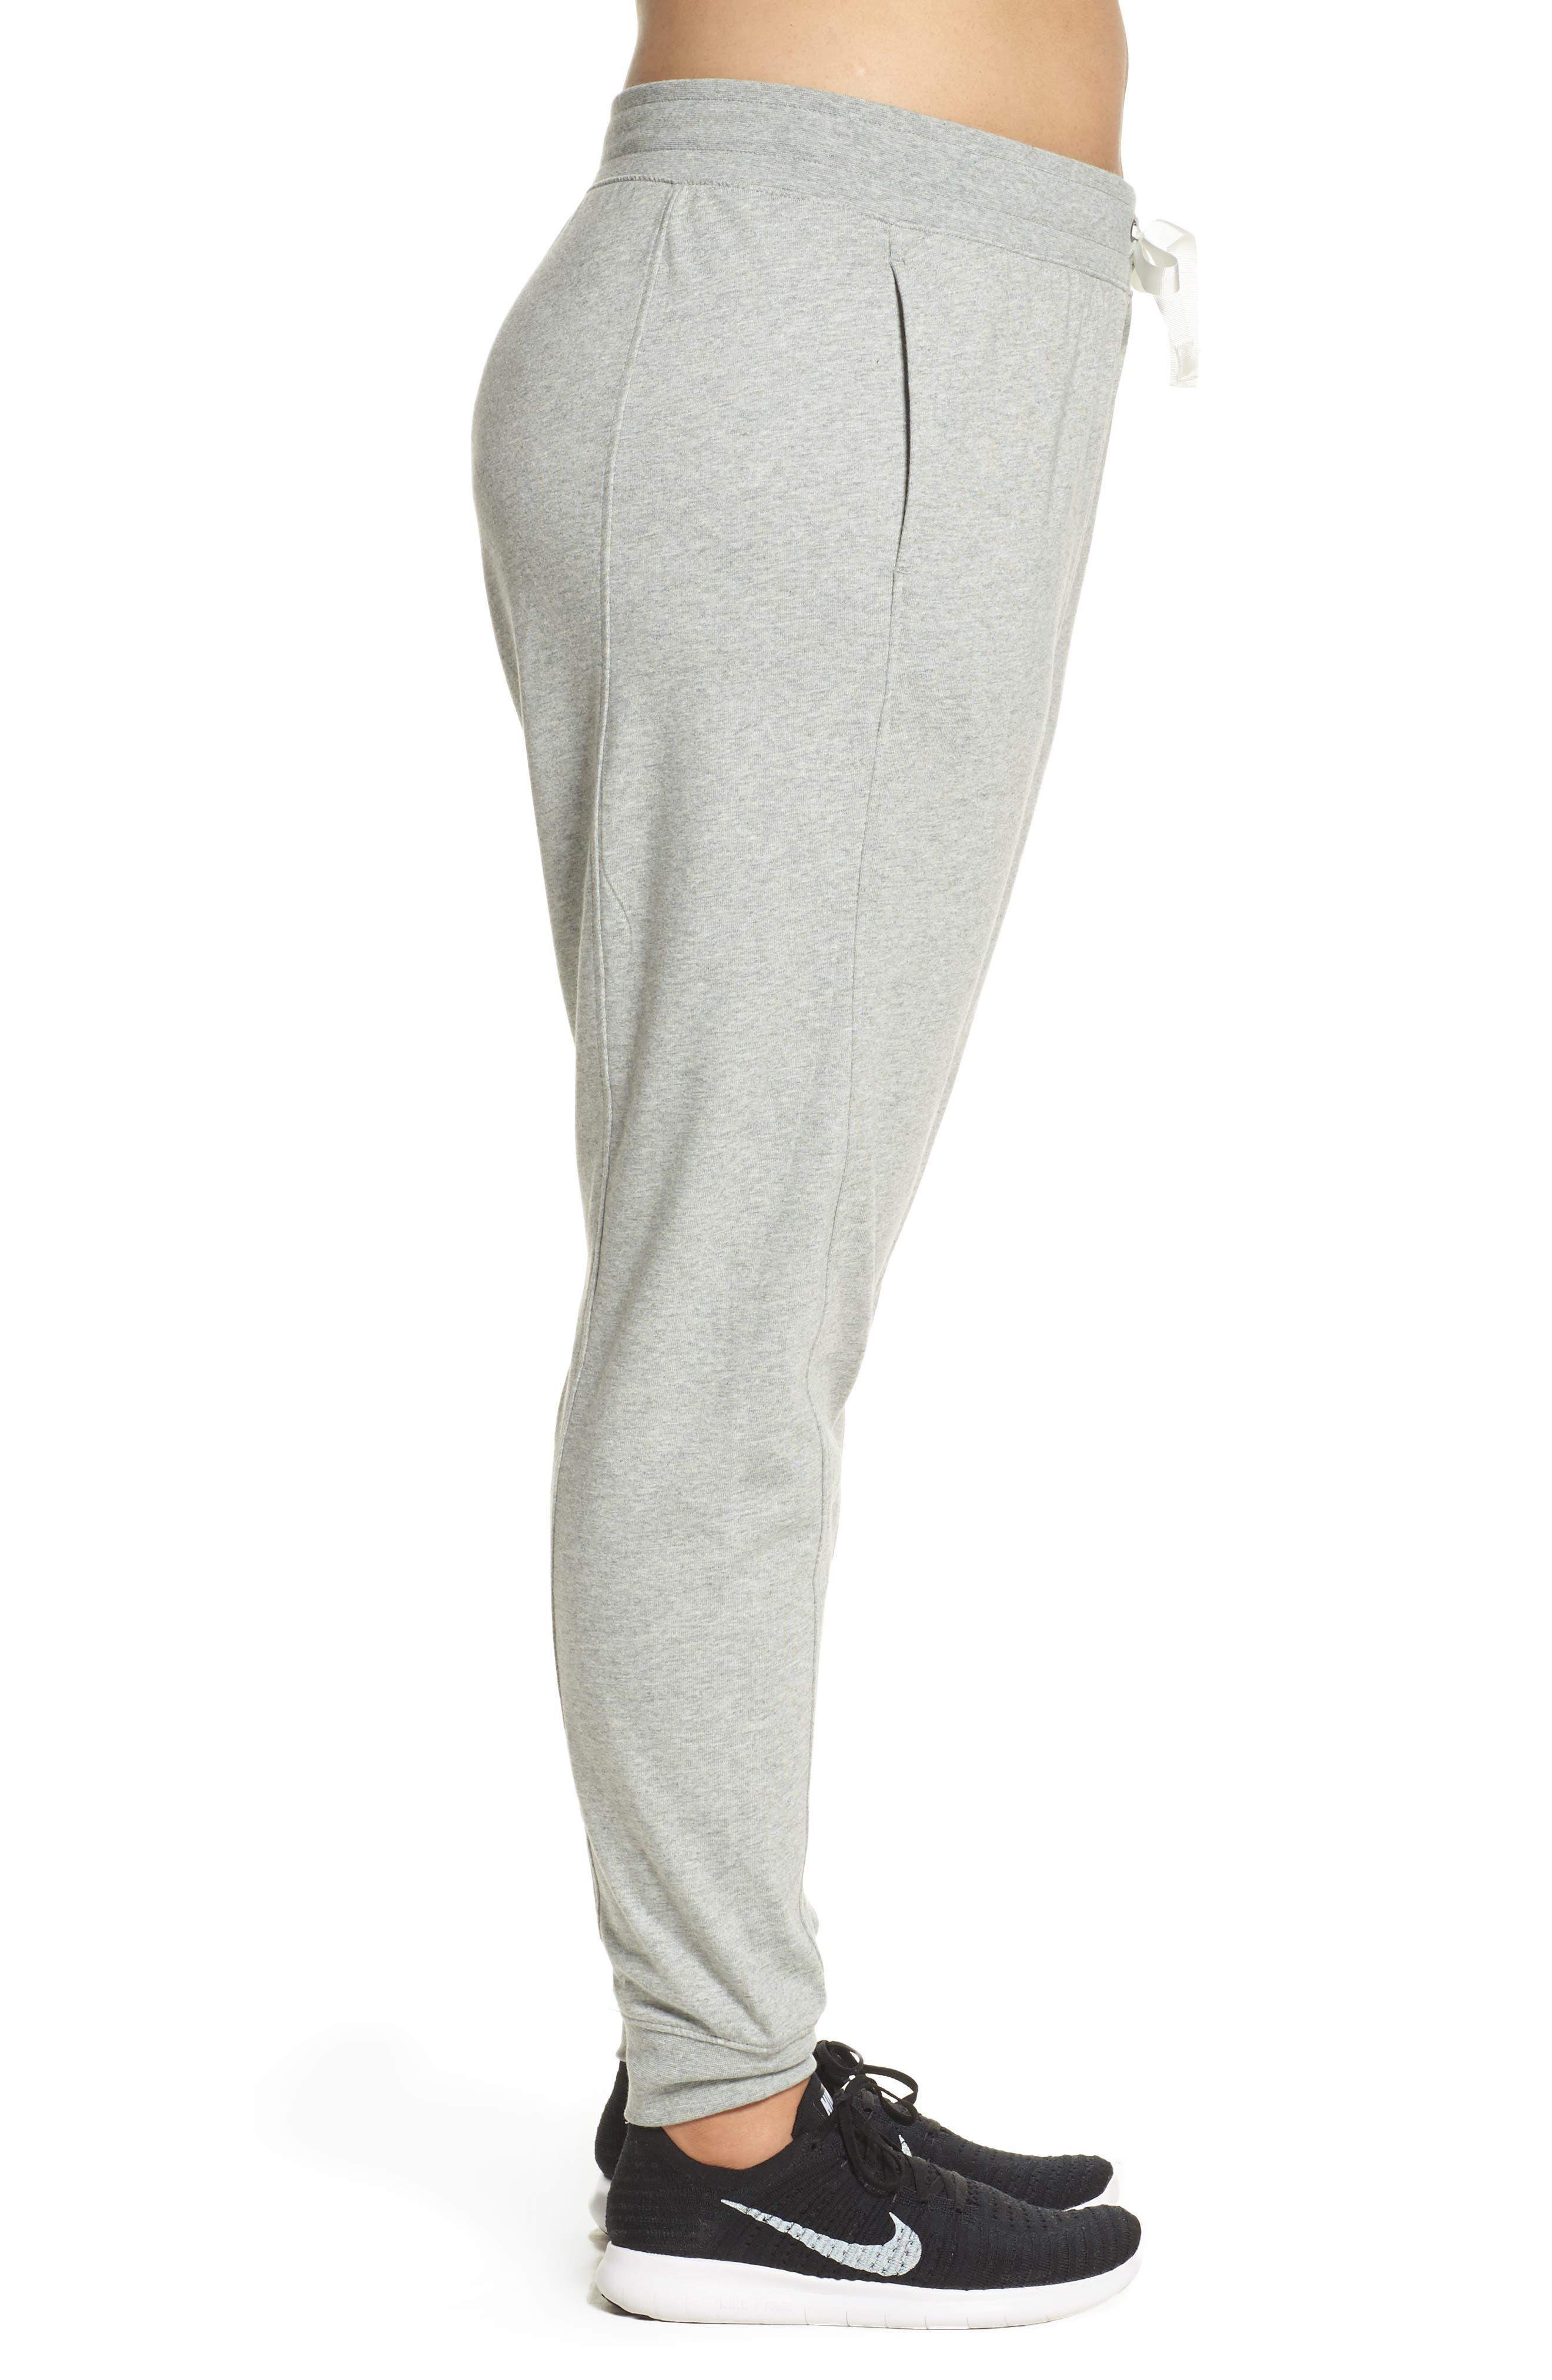 Sportswear Gym Classic Pants,                             Alternate thumbnail 3, color,                             Dk Grey Heather/ Sail